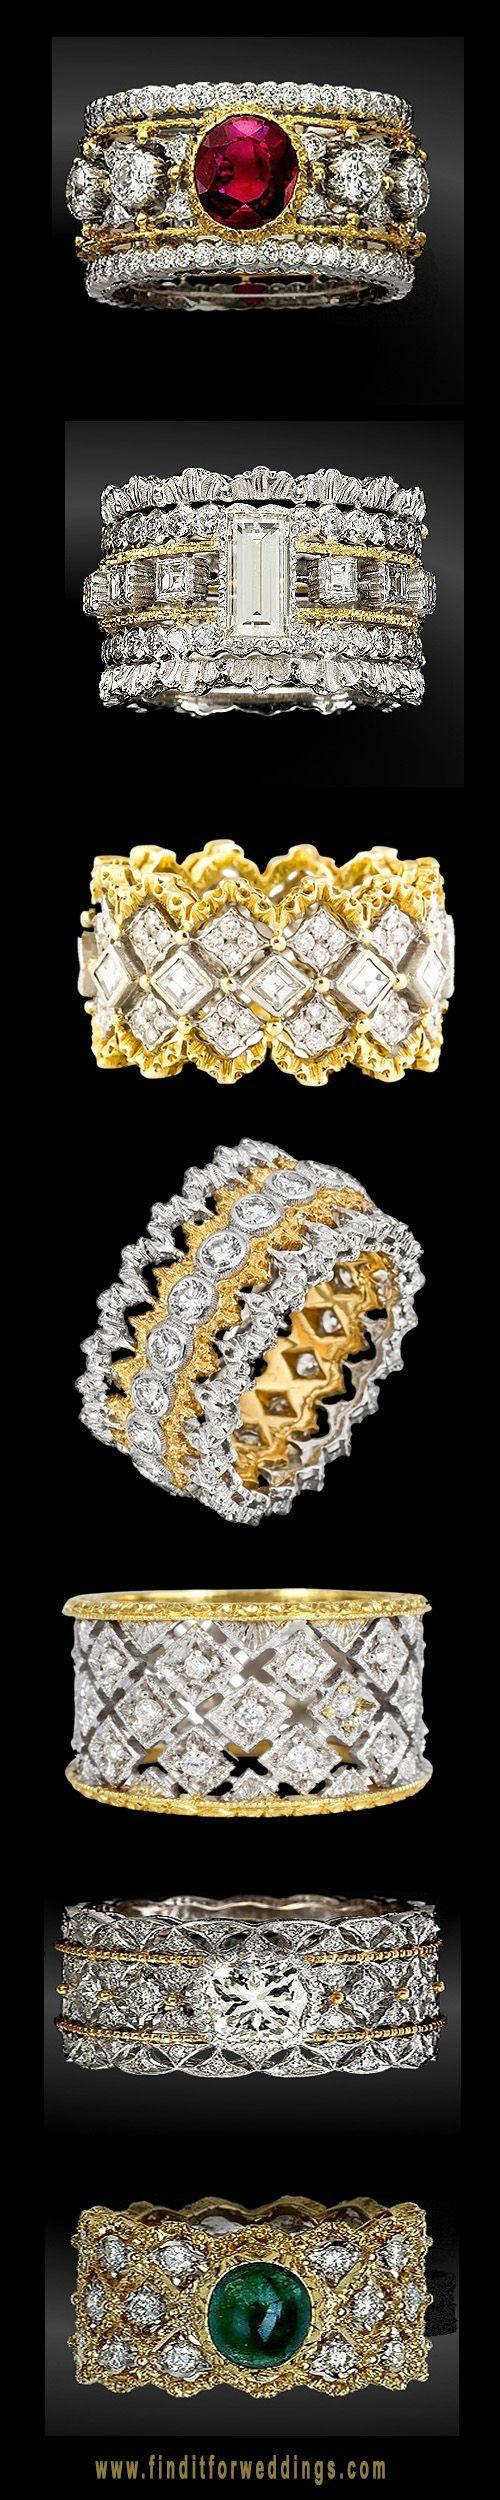 Buccellati- Diamond Rings #LadyLuxuryDesigns